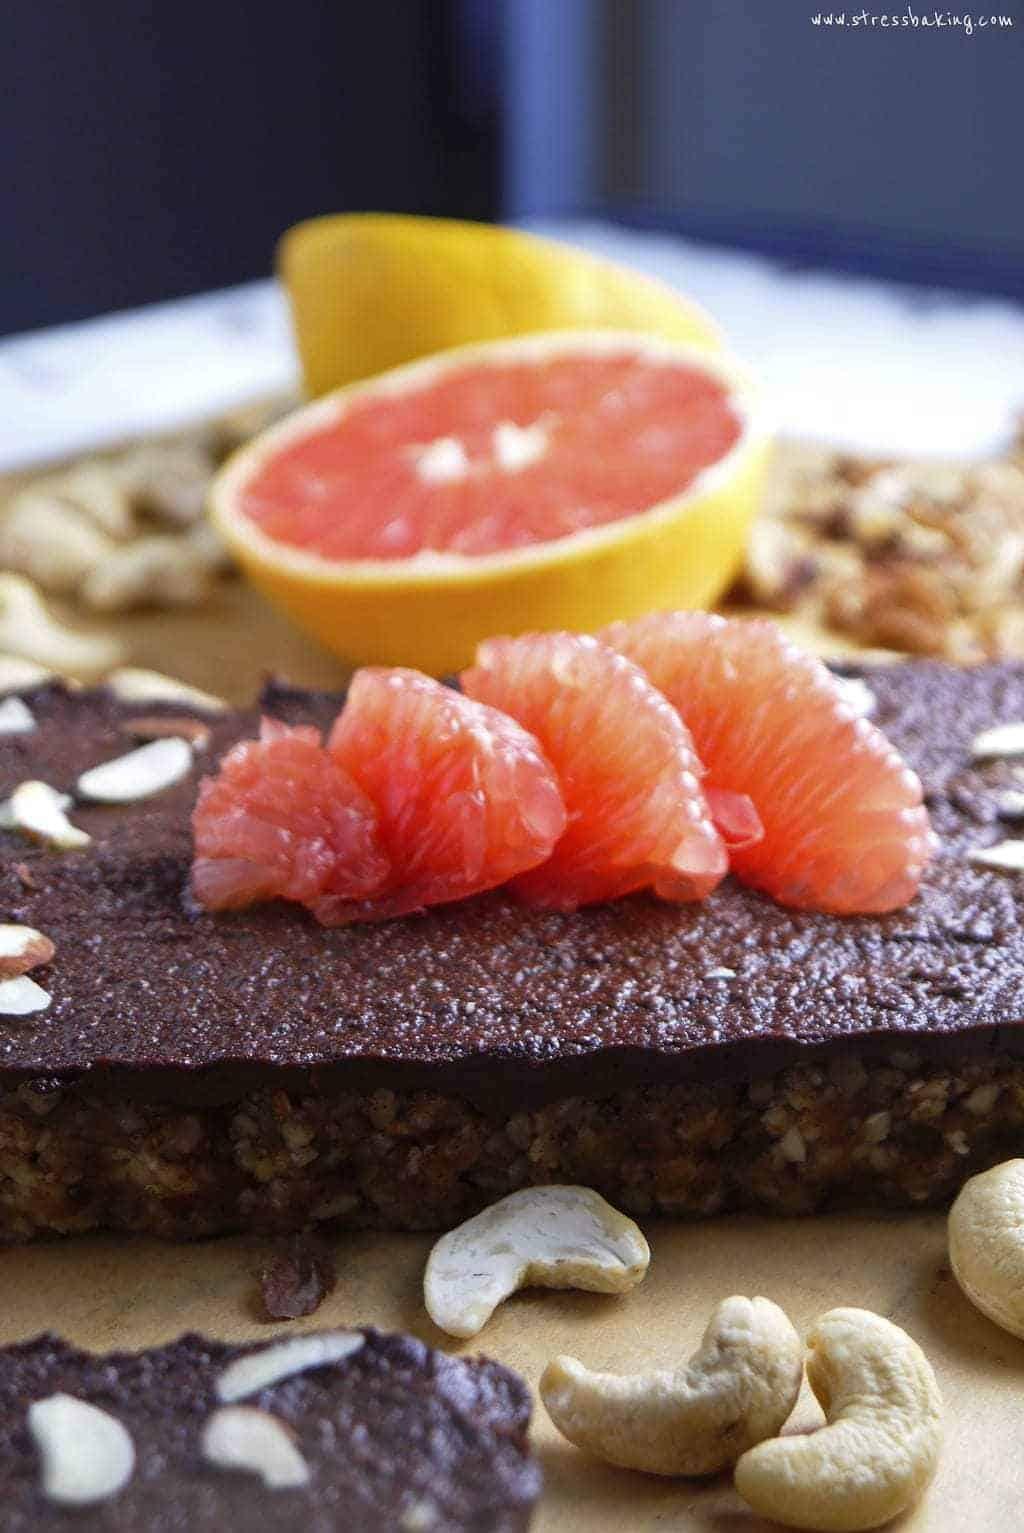 No-Bake Grapefruit Tart with Nut Crust